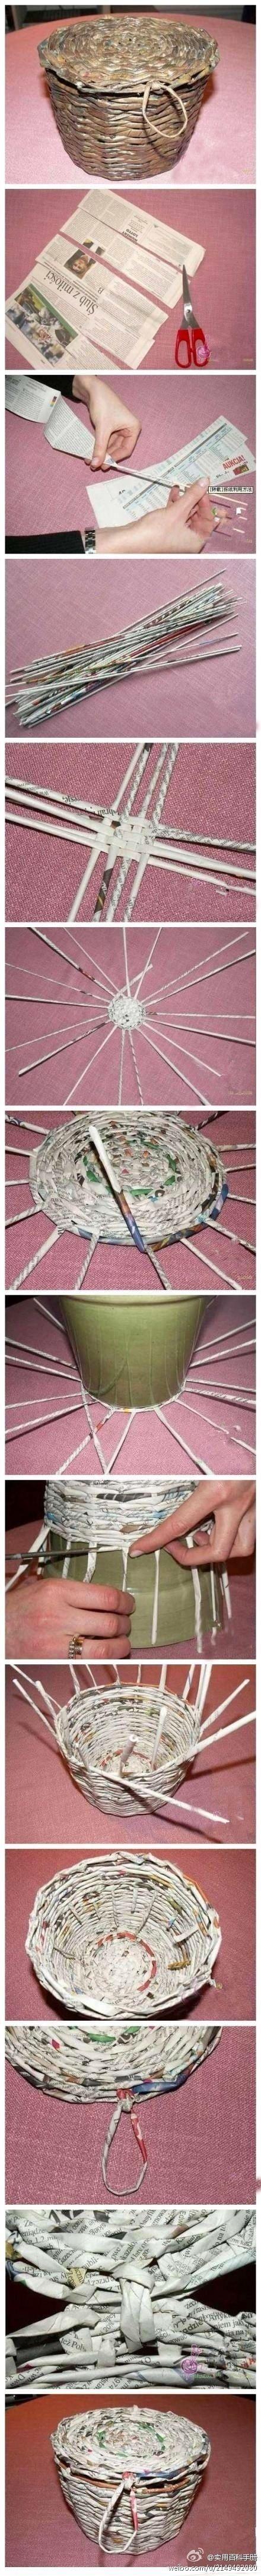 DIY Newspaper Basket DIY Newspaper Basket by diyforever